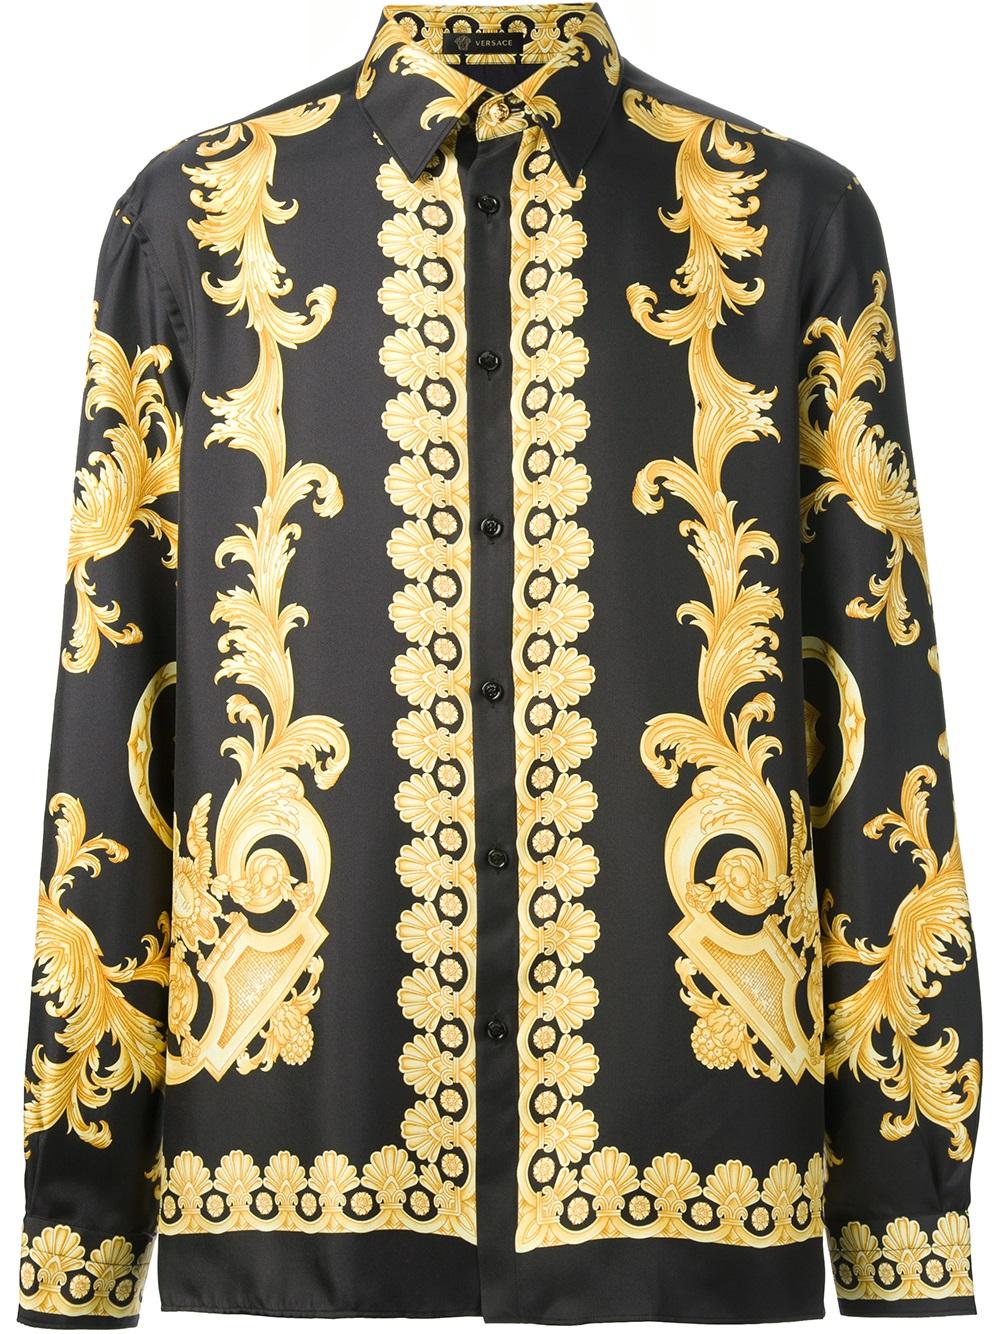 Versace Baroque Print Shirt in Black for Men - Lyst